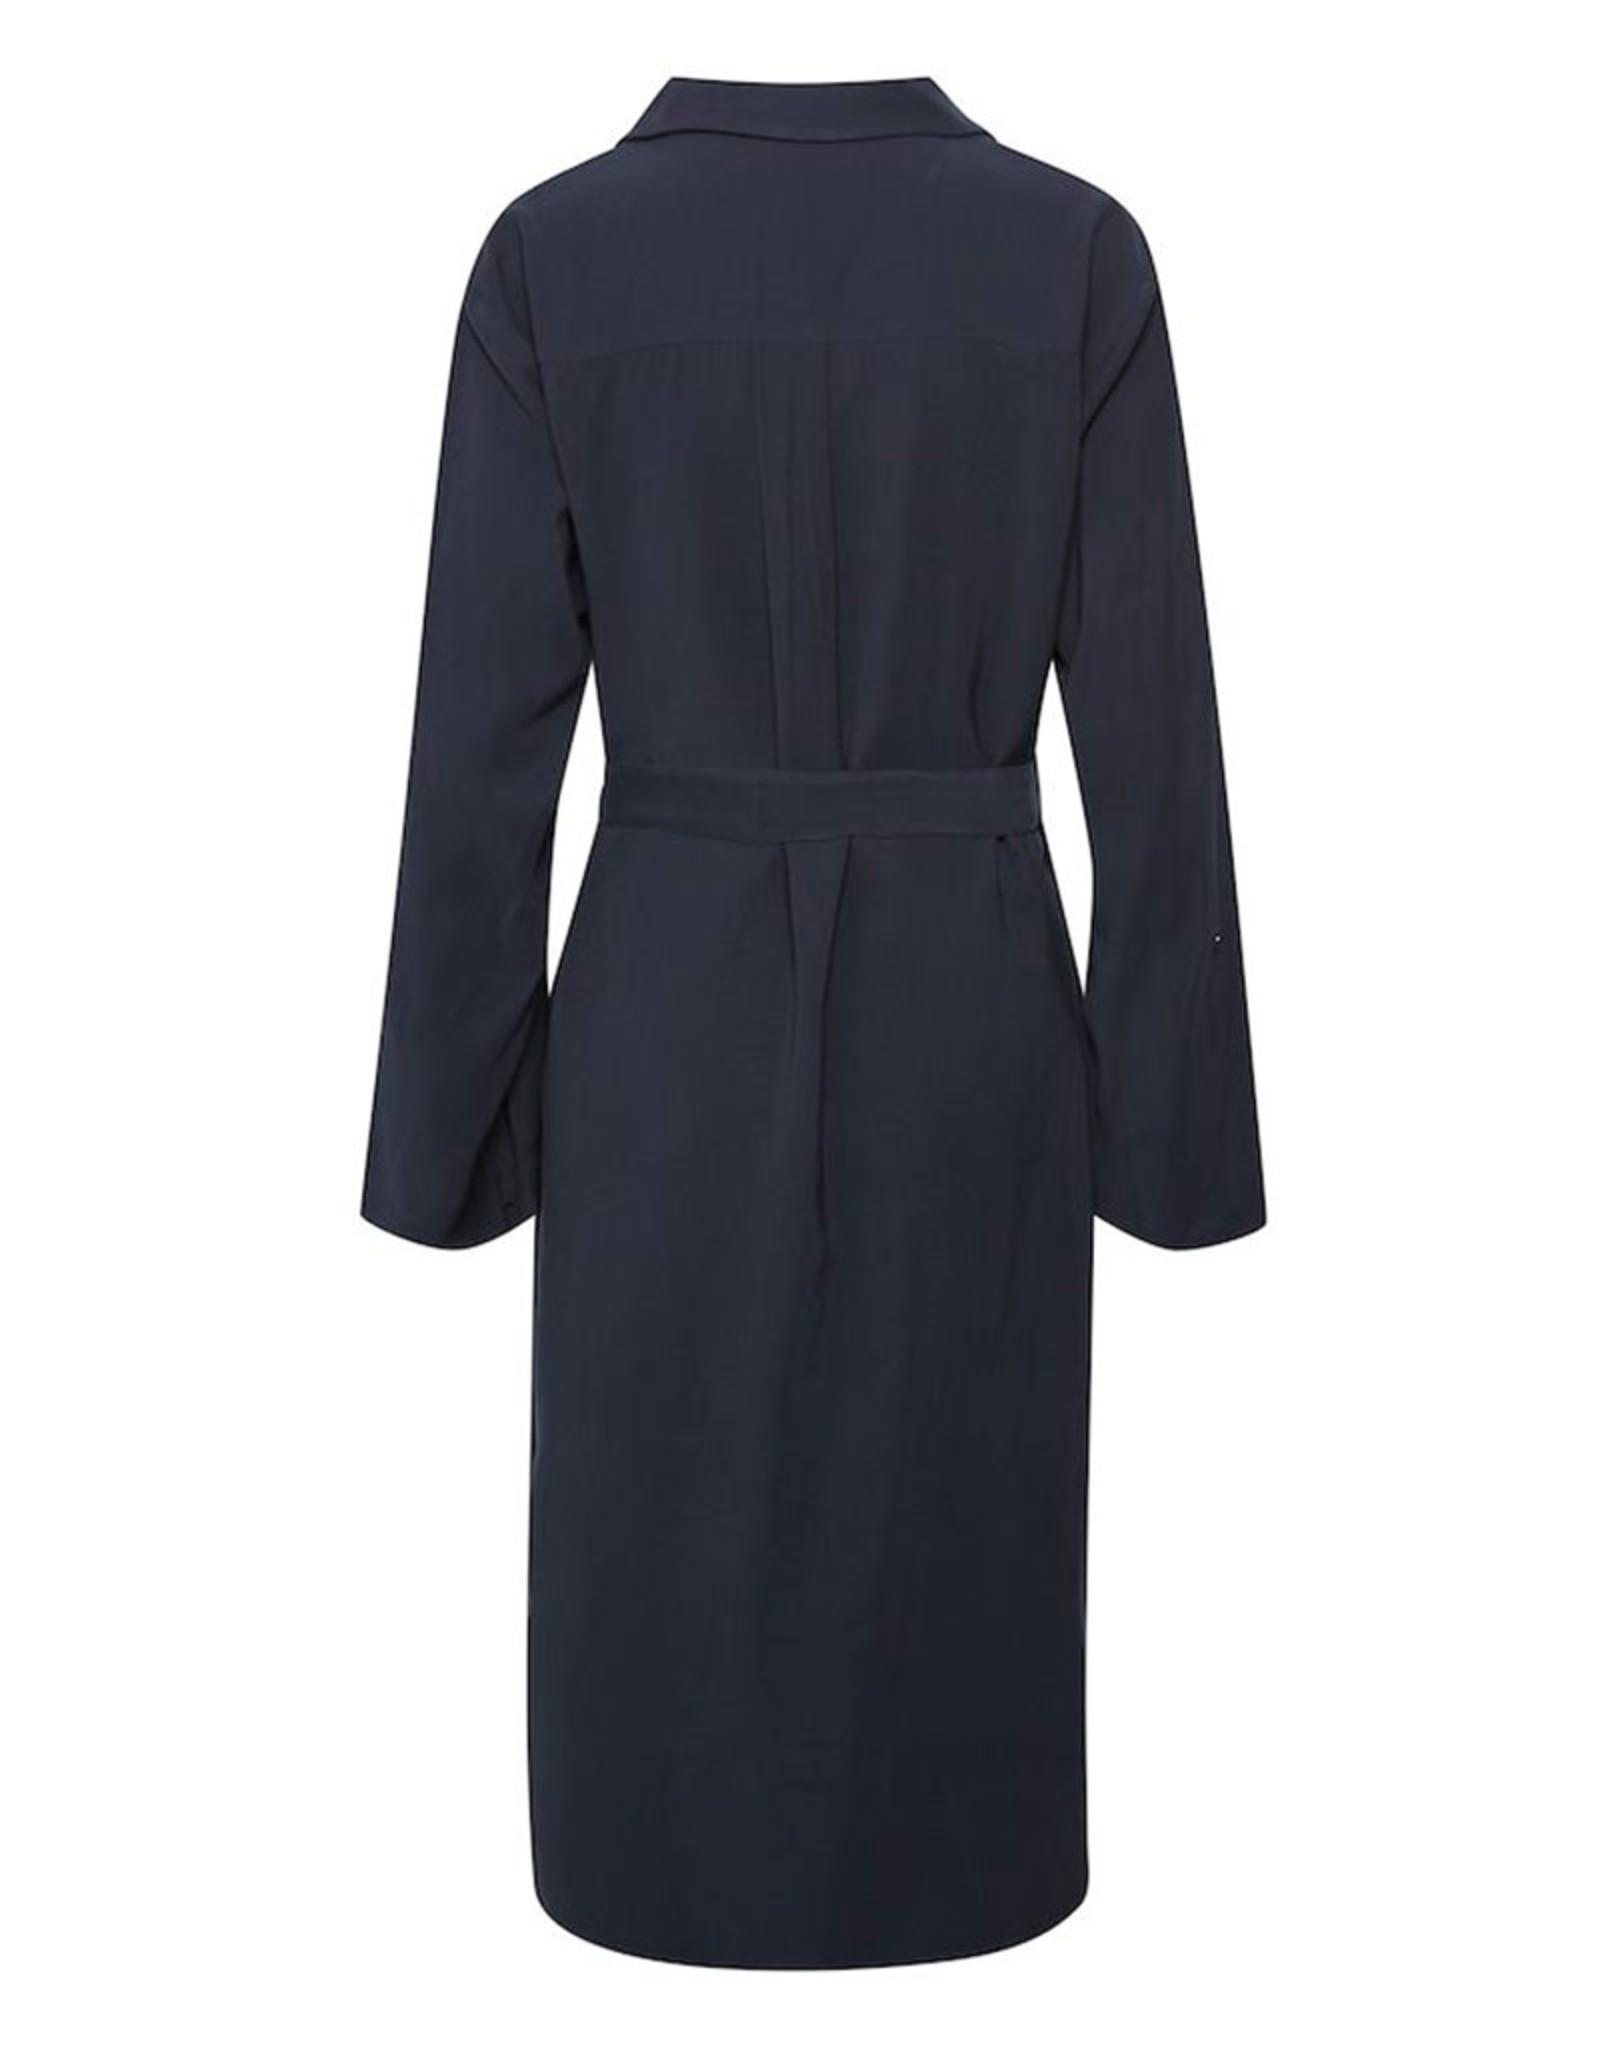 My Essential Wardrobe Louisa Shirt Dress